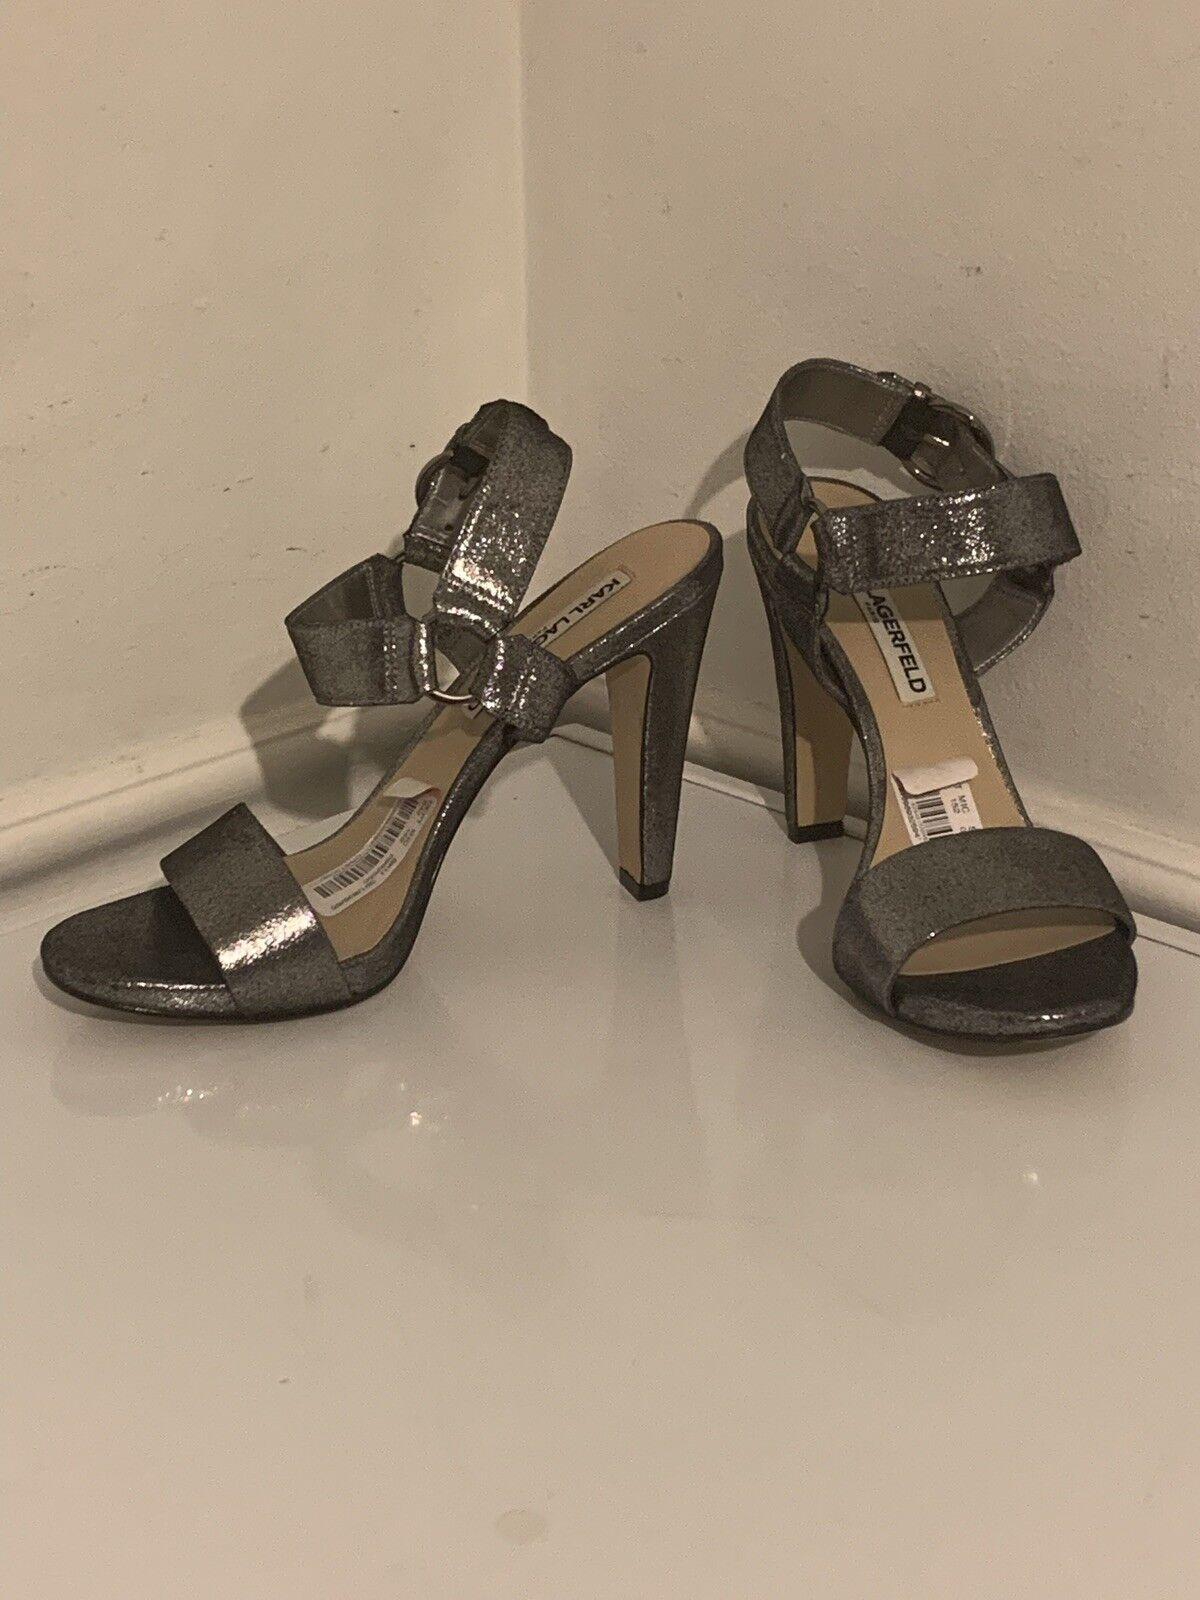 New KARL LAGERFELD PARIS Cieone Metallic Leather Ankle Strap Dress Sandals 10M